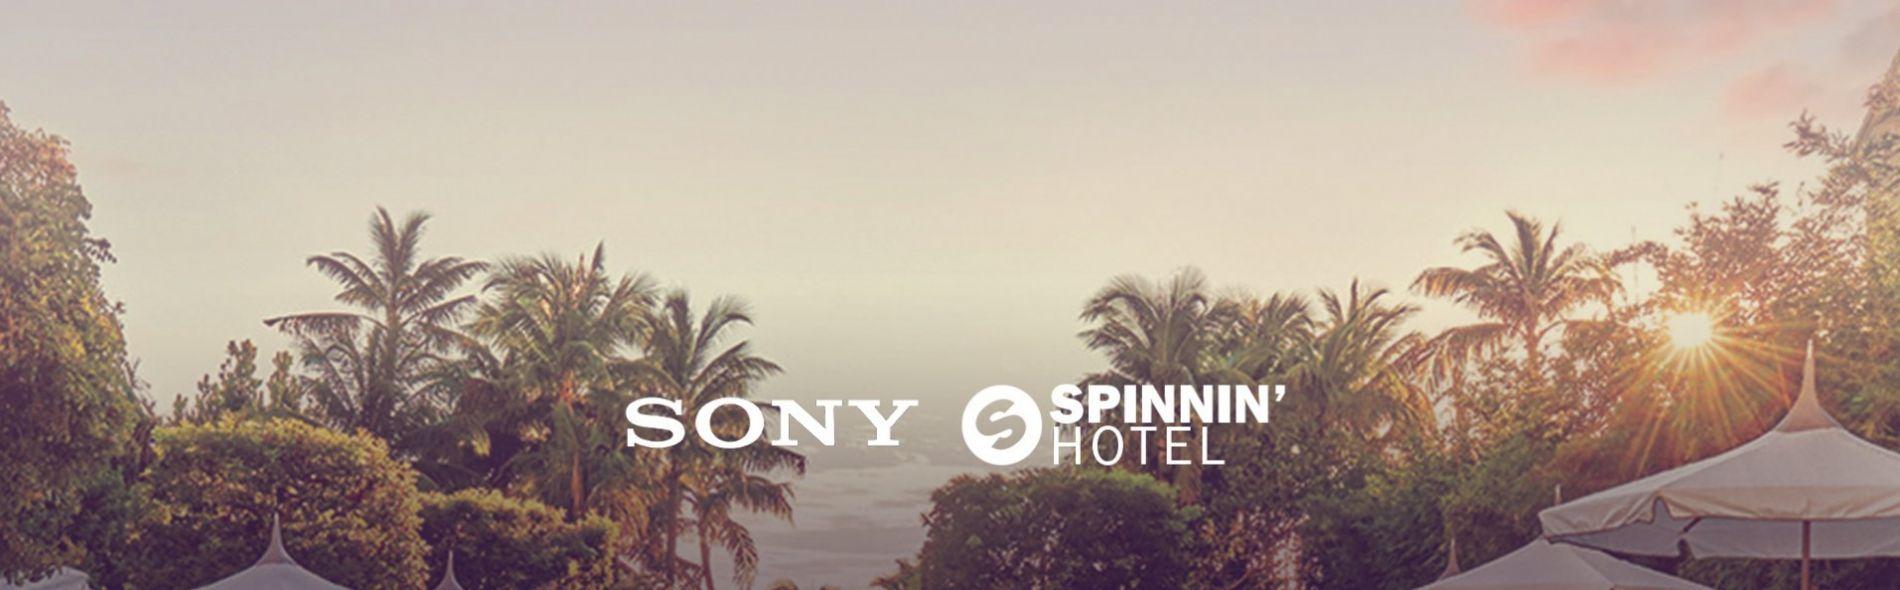 Sony & Spinnin' Hotel